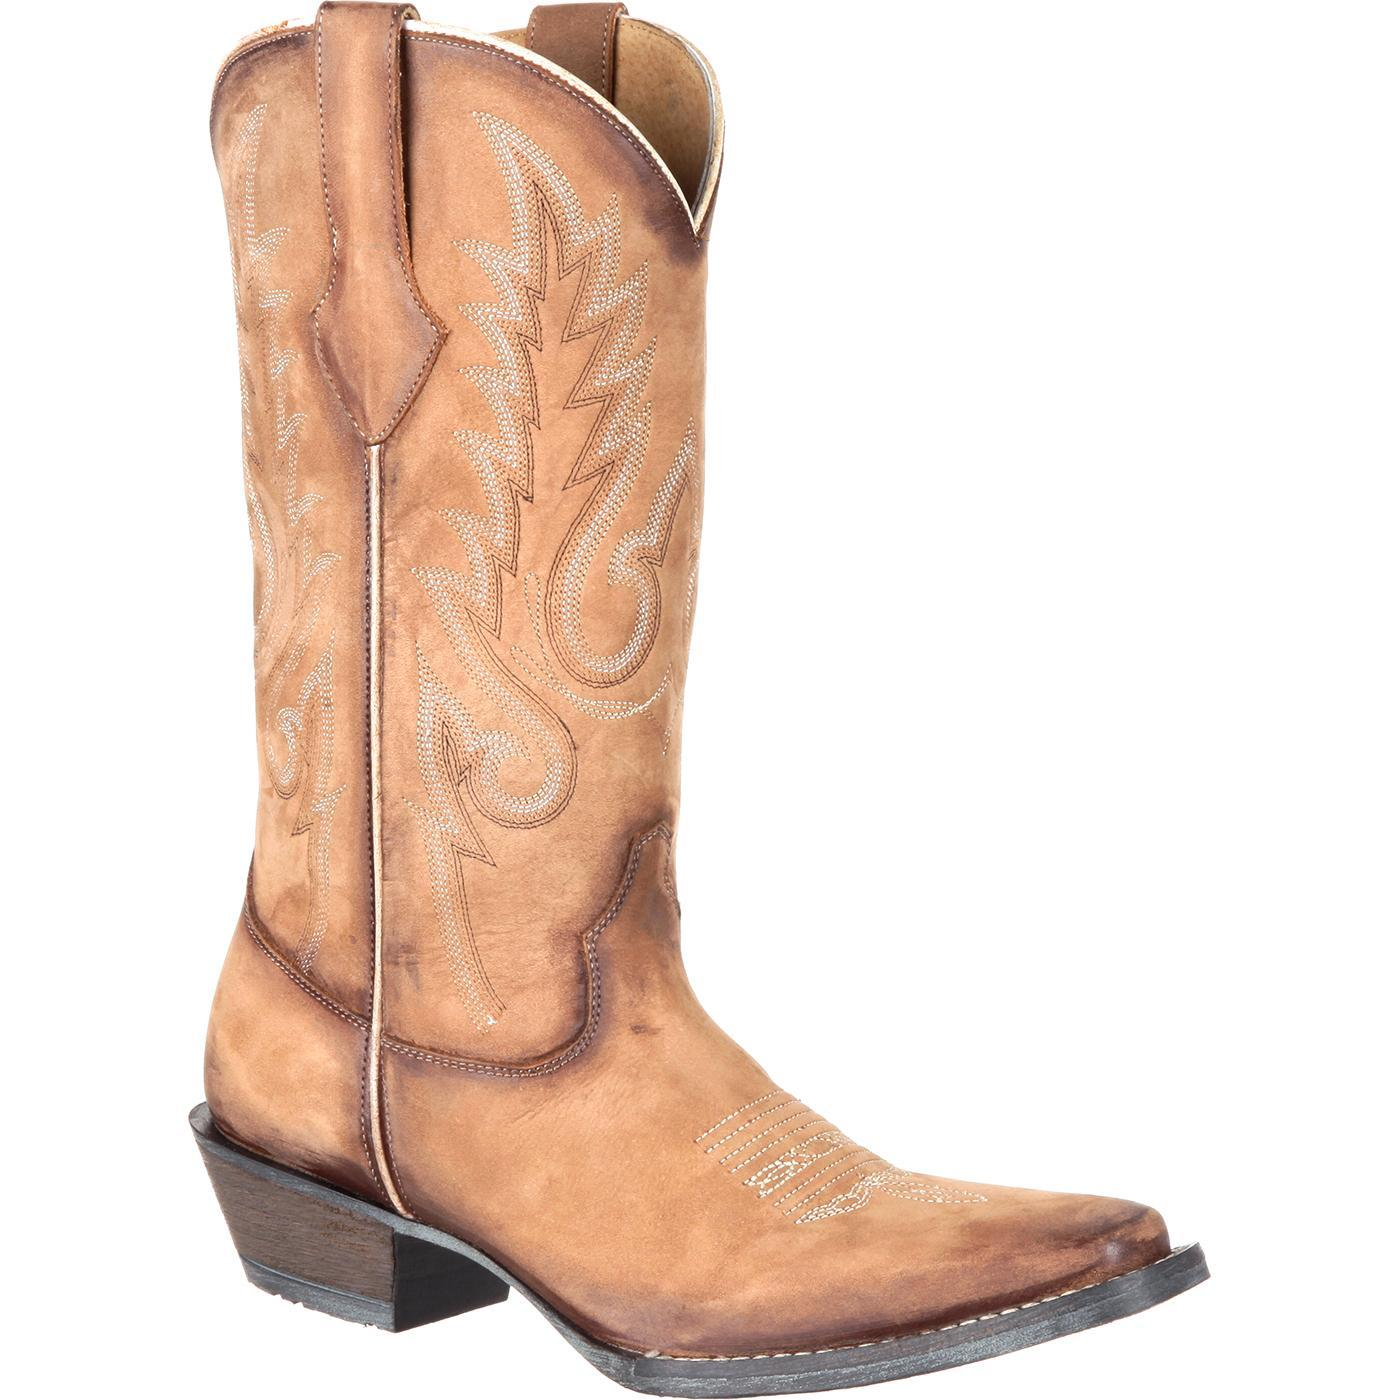 77115b1e0eb Durango Dream Catcher Women s Western Boot